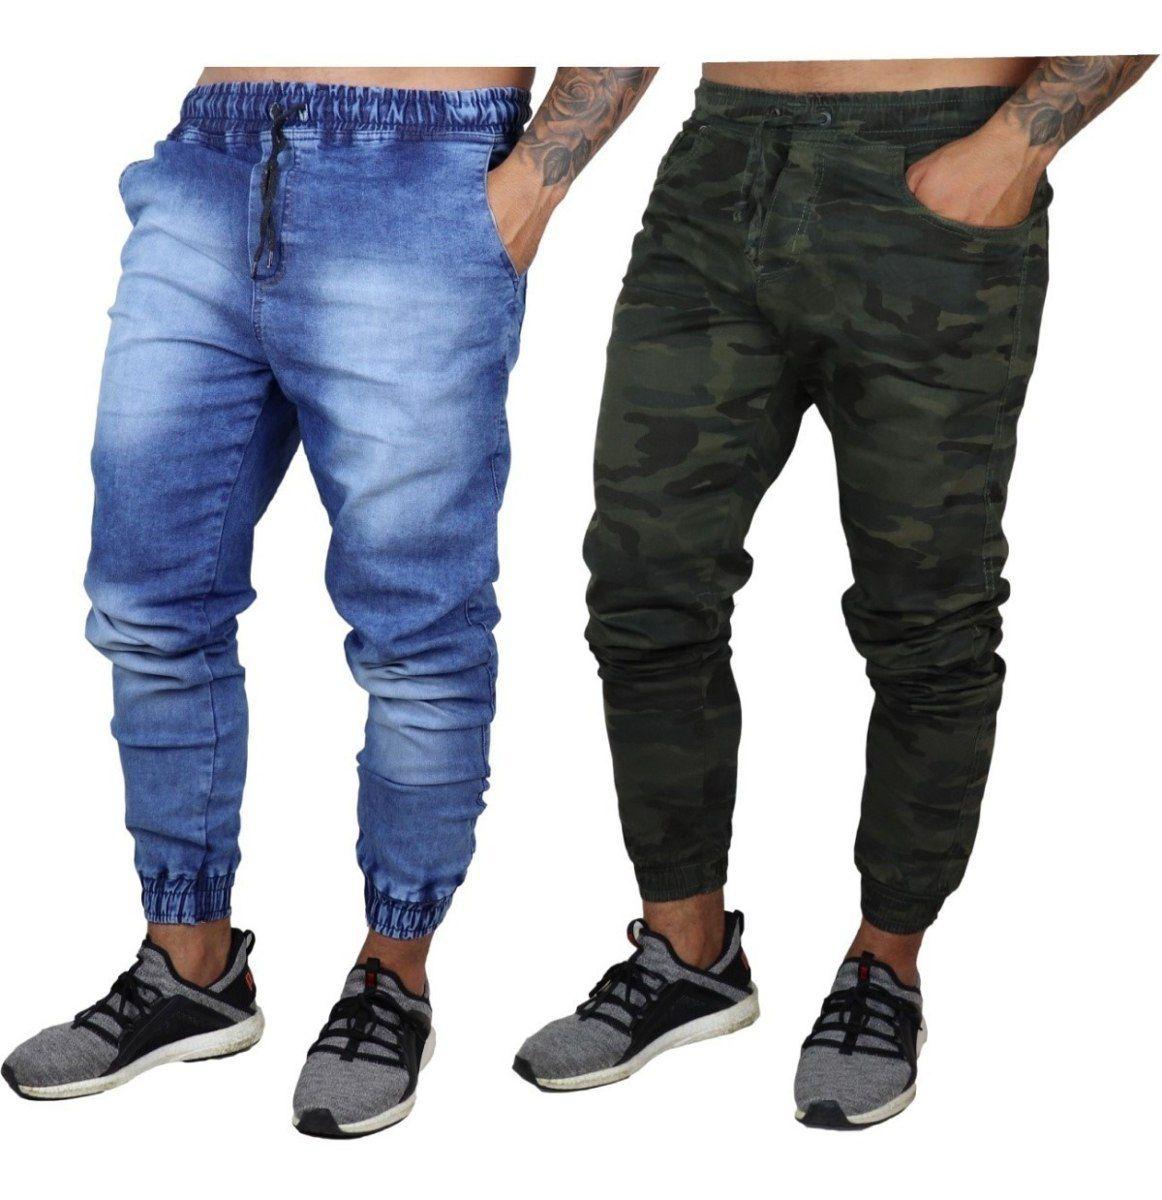 Kit 10 Calças Jeans Camuflada Lisa Masculina Jogger Punho Lycra